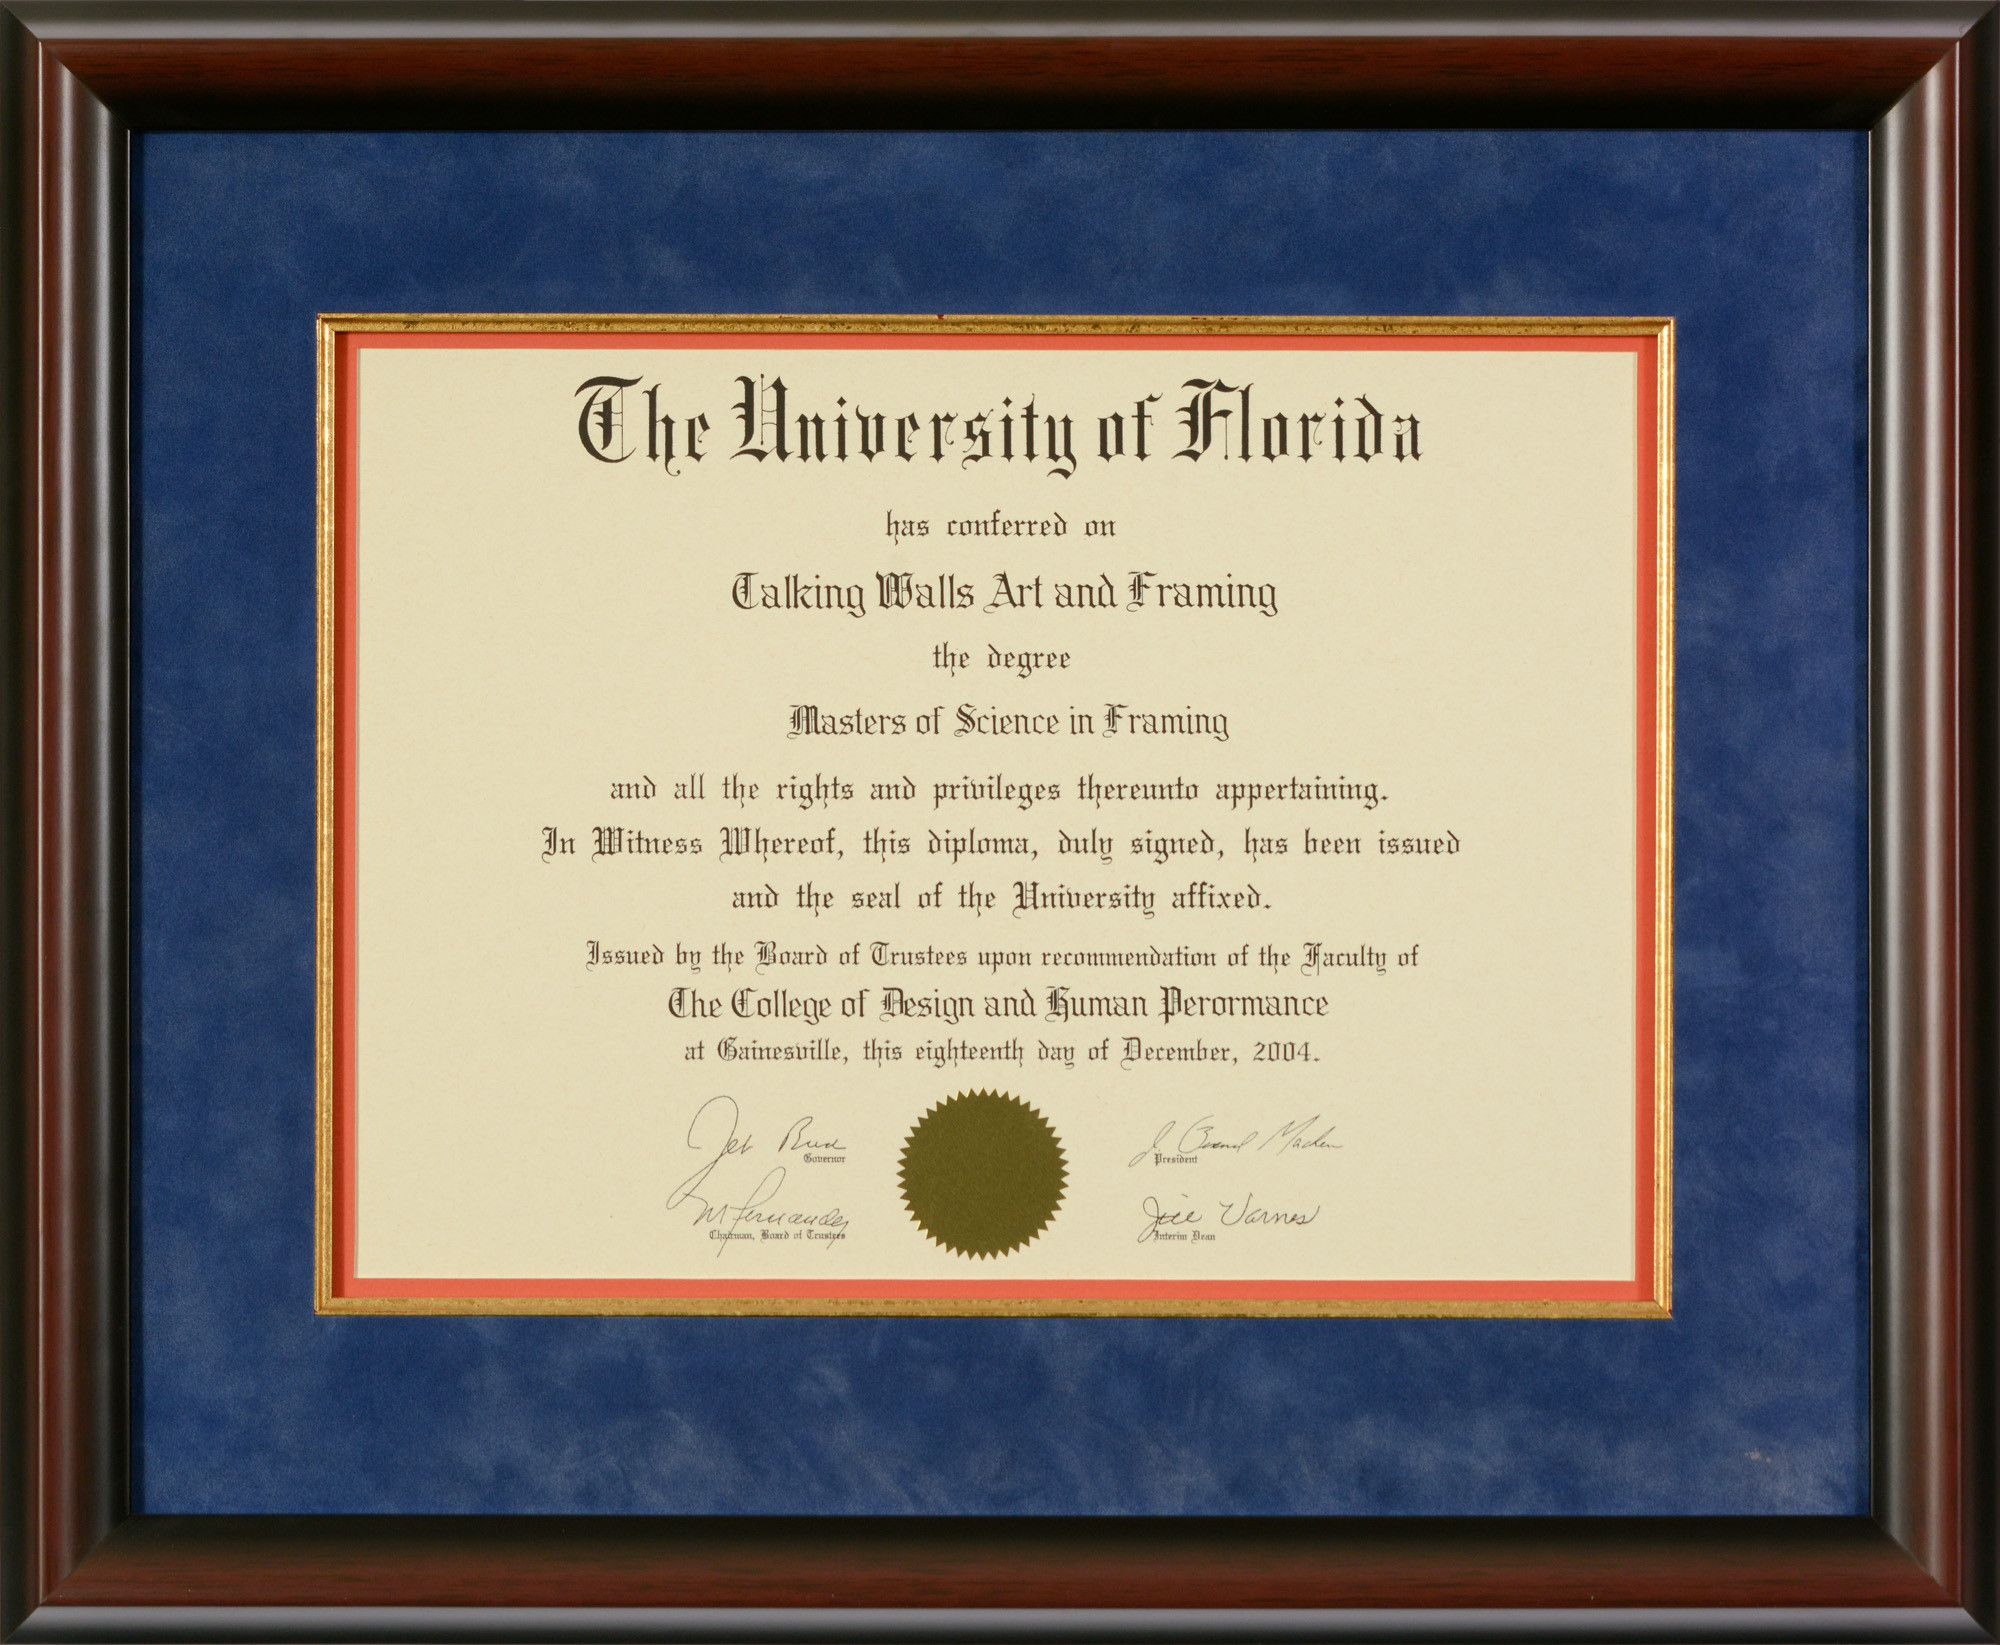 University Of Florida Diploma Frame Blue Suede Matting Talking Walls Diploma Frame Diploma University Of Florida